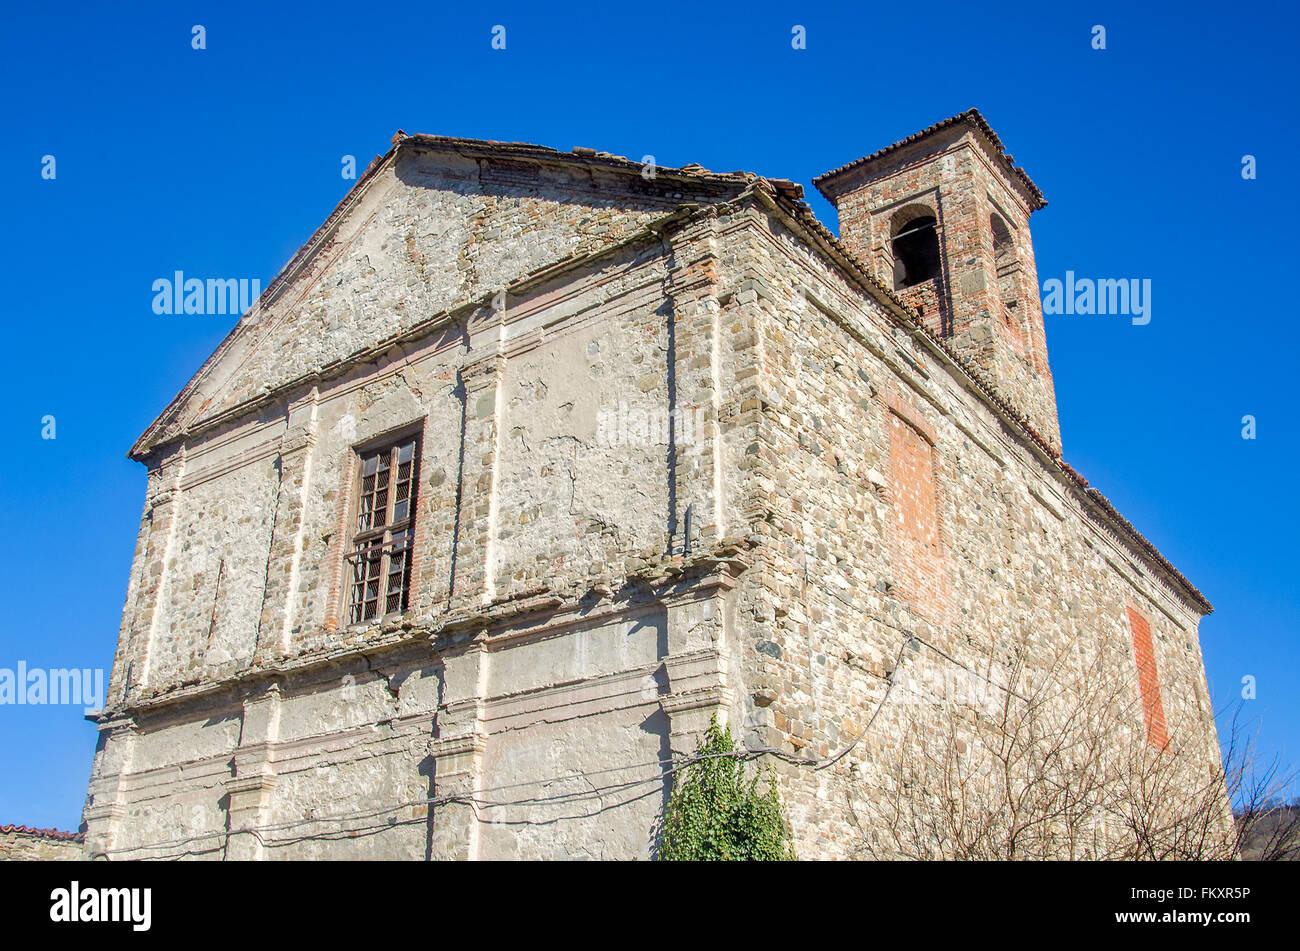 abandoned monastery in Bobbio - Piacenza - Italy - Stock Image